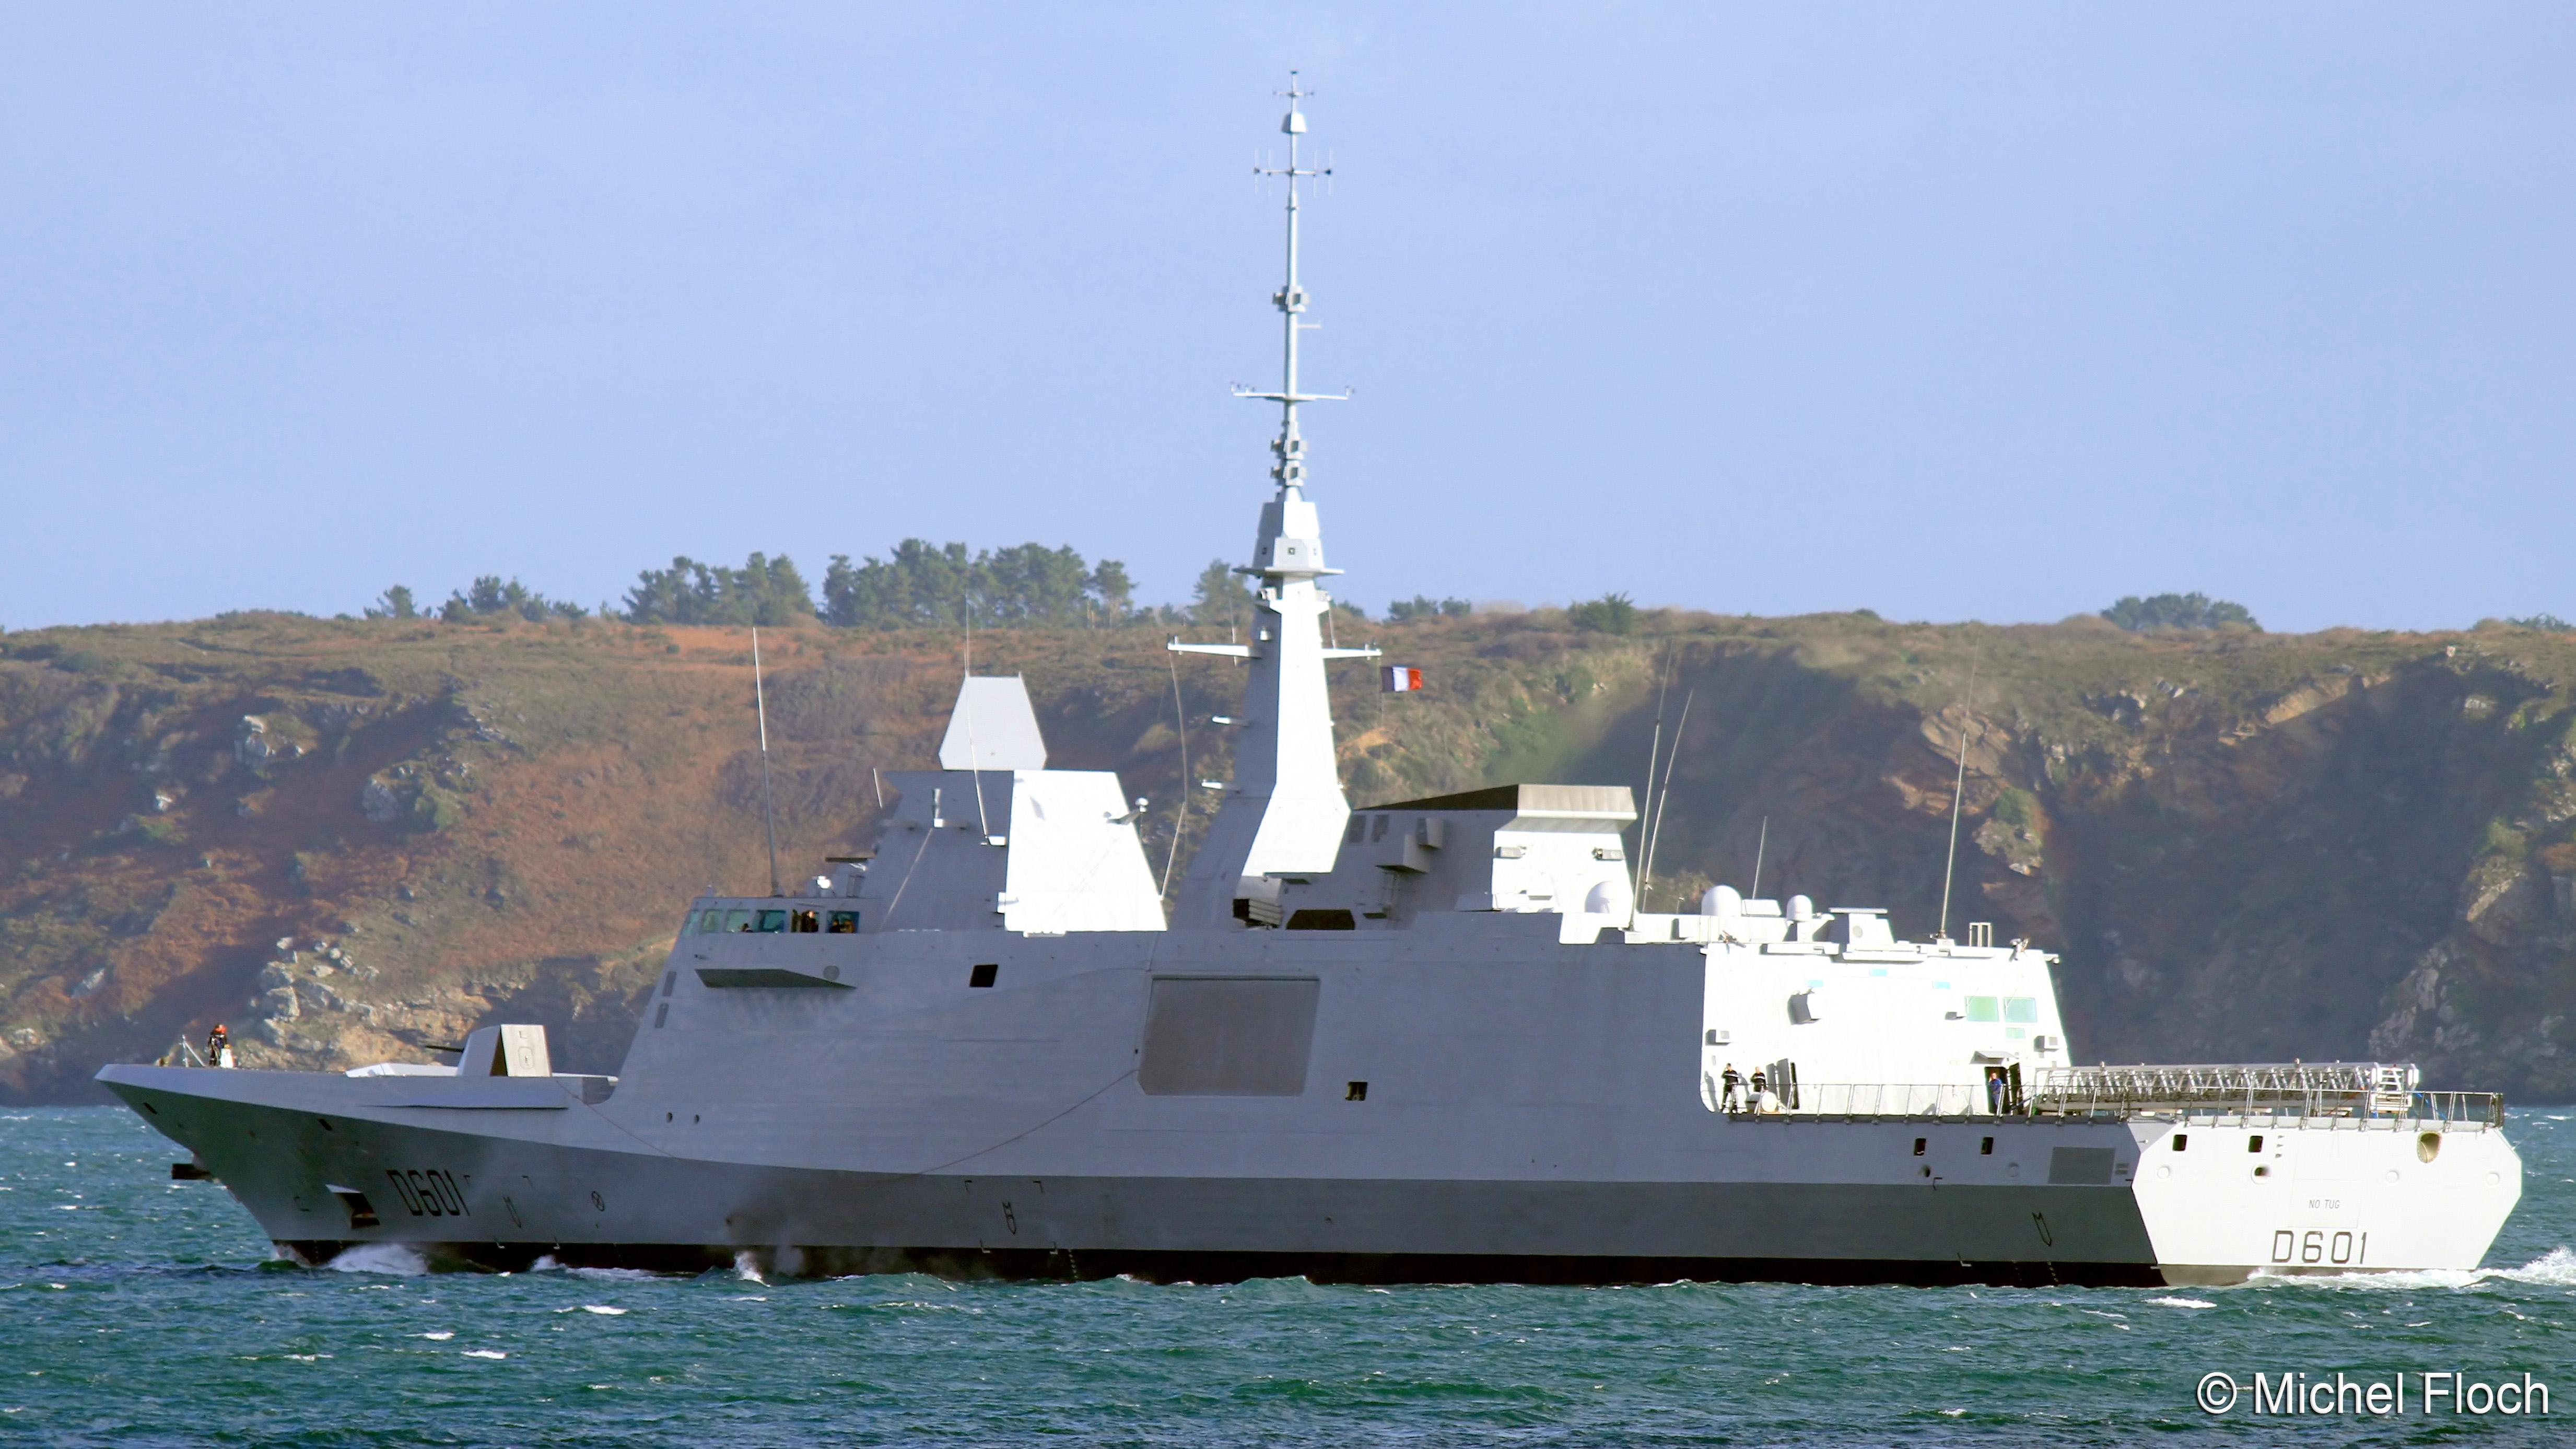 Royal Moroccan Navy FREMM Frigate / FREMM Marocaine - Mohammed VI 10885943576_478c94ec96_o